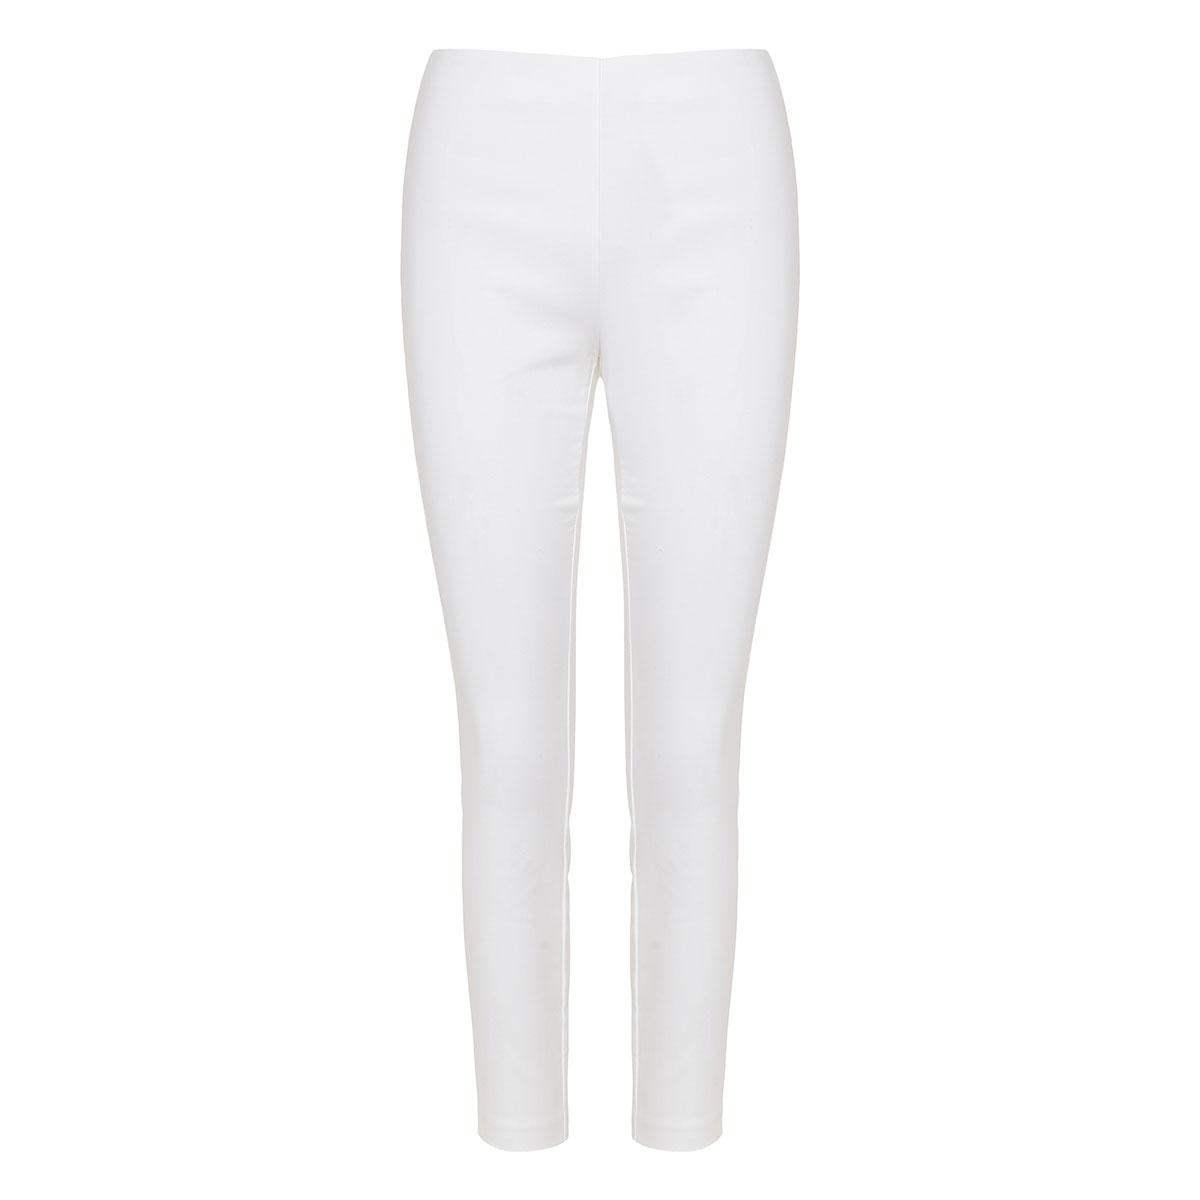 Simone skinny trousers